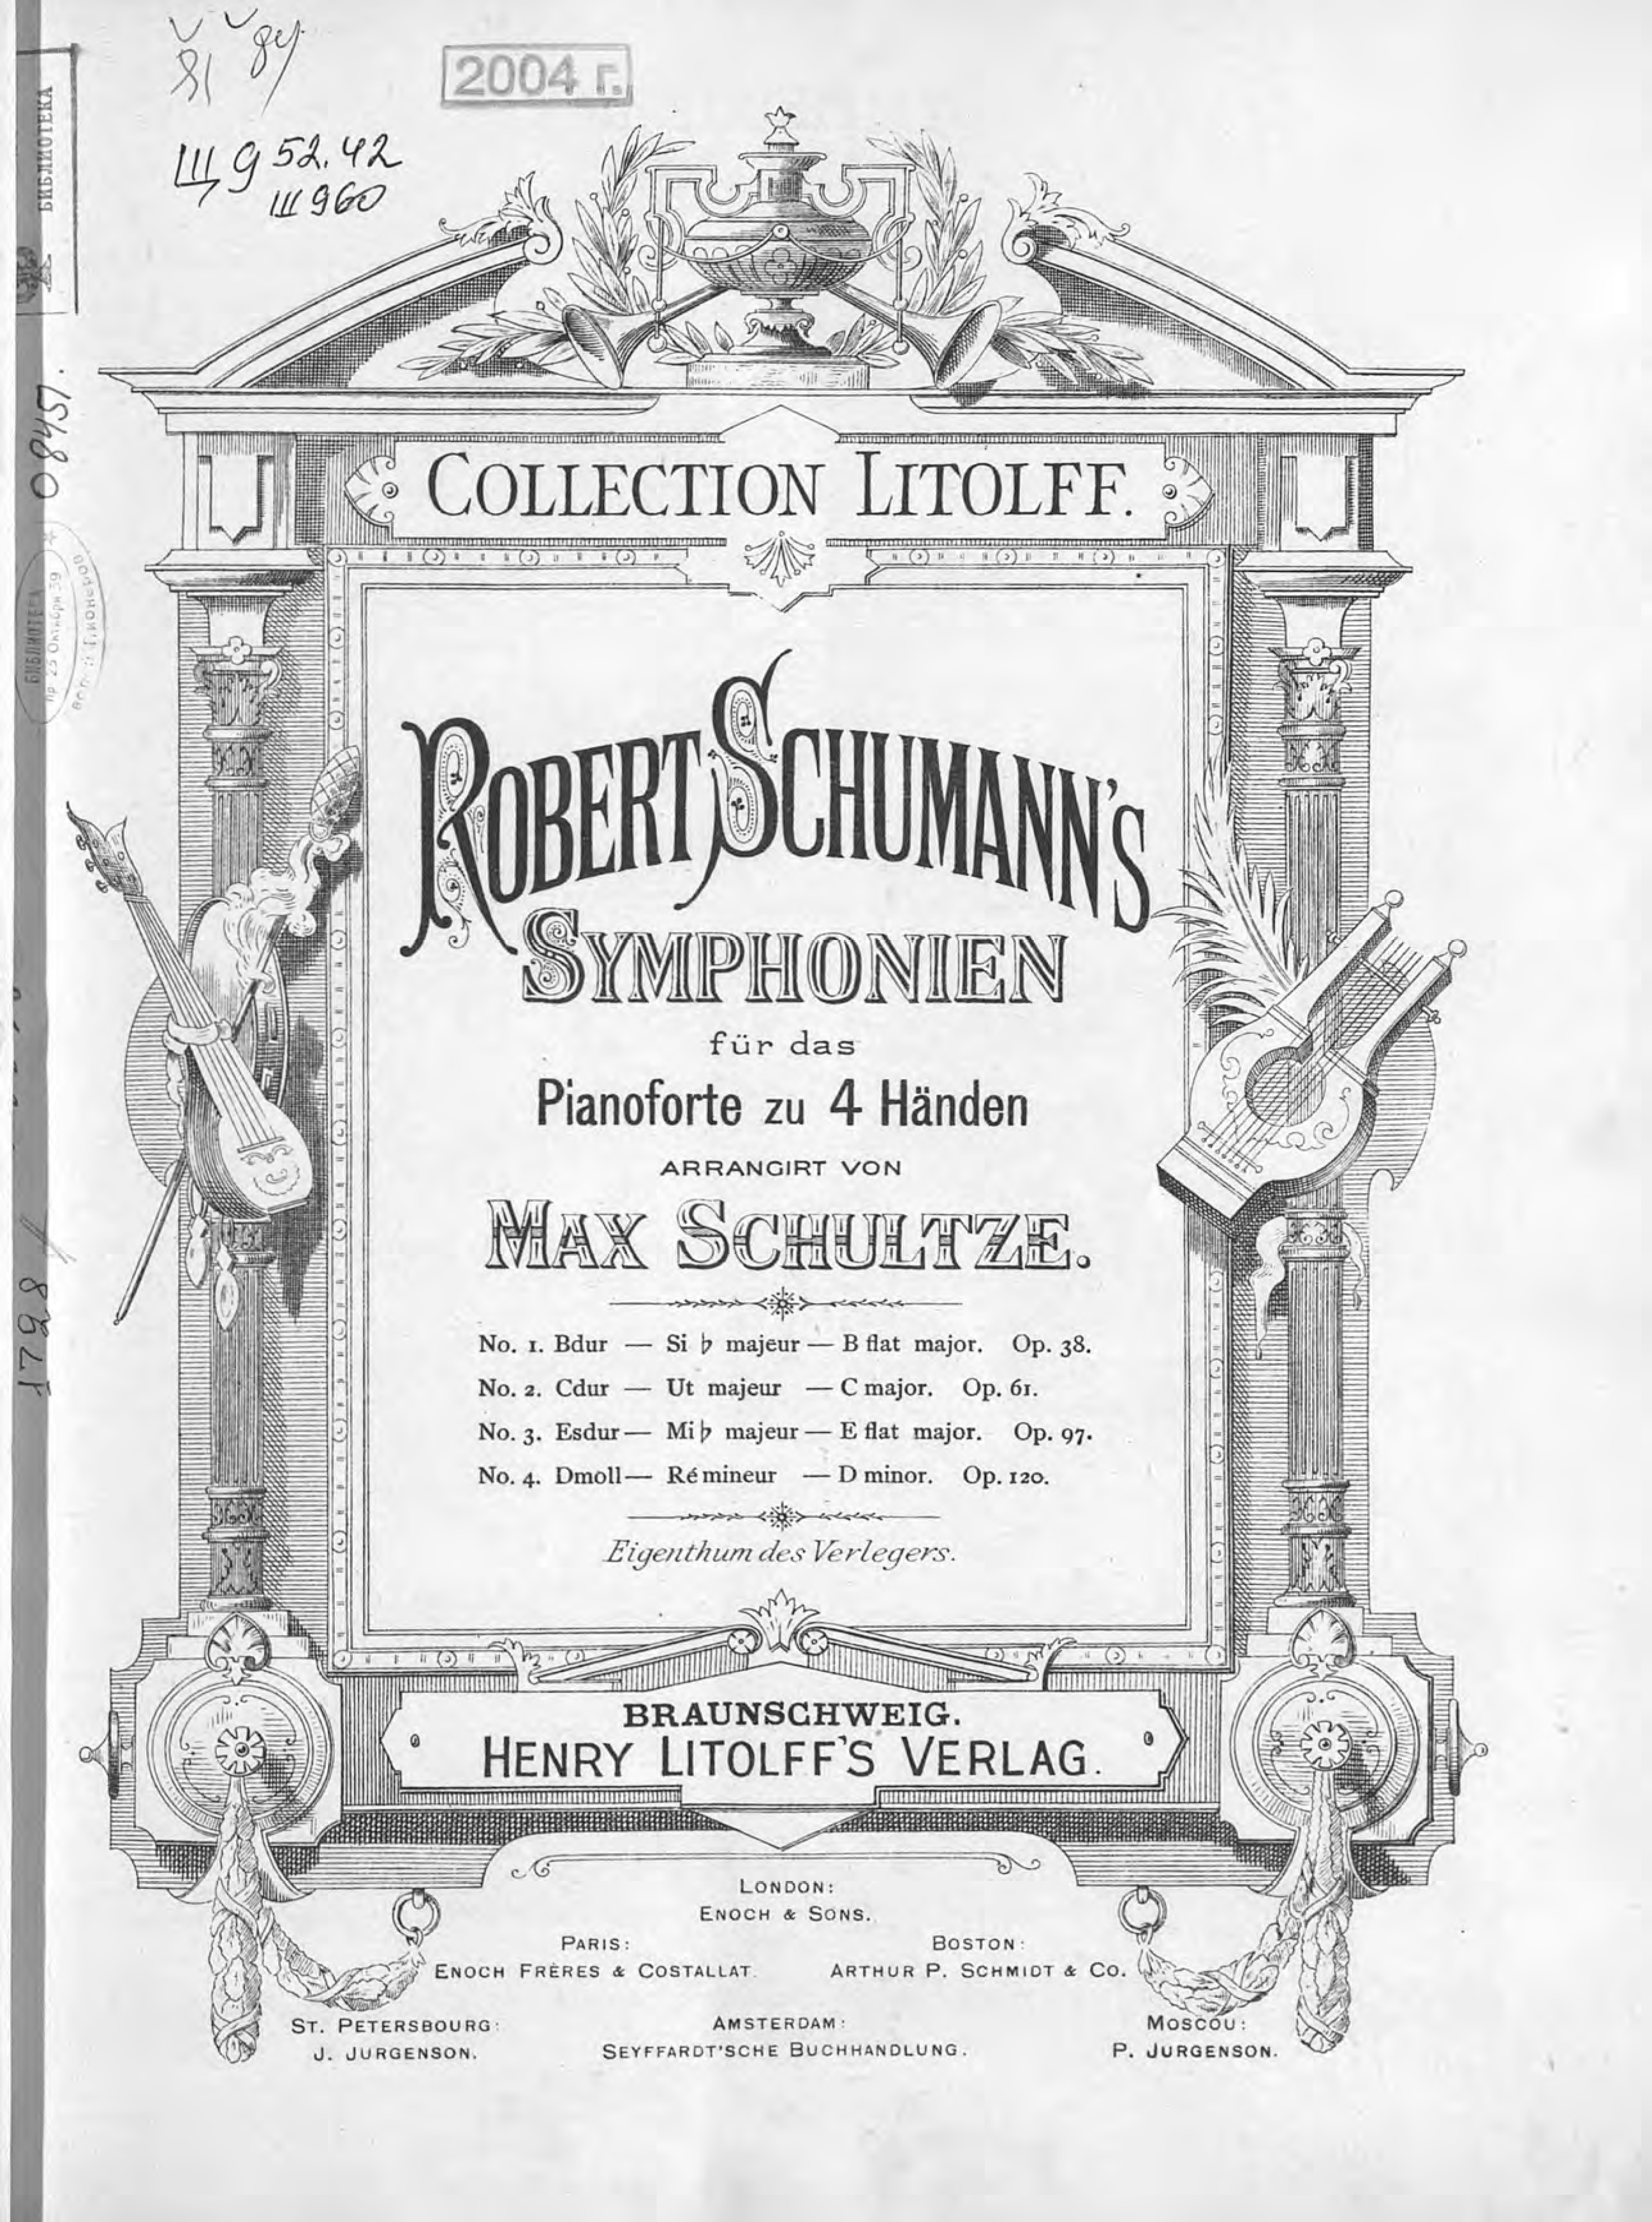 Роберт Шуман Symphonie № 3, Es dur густав малер erste symphonie in d dur